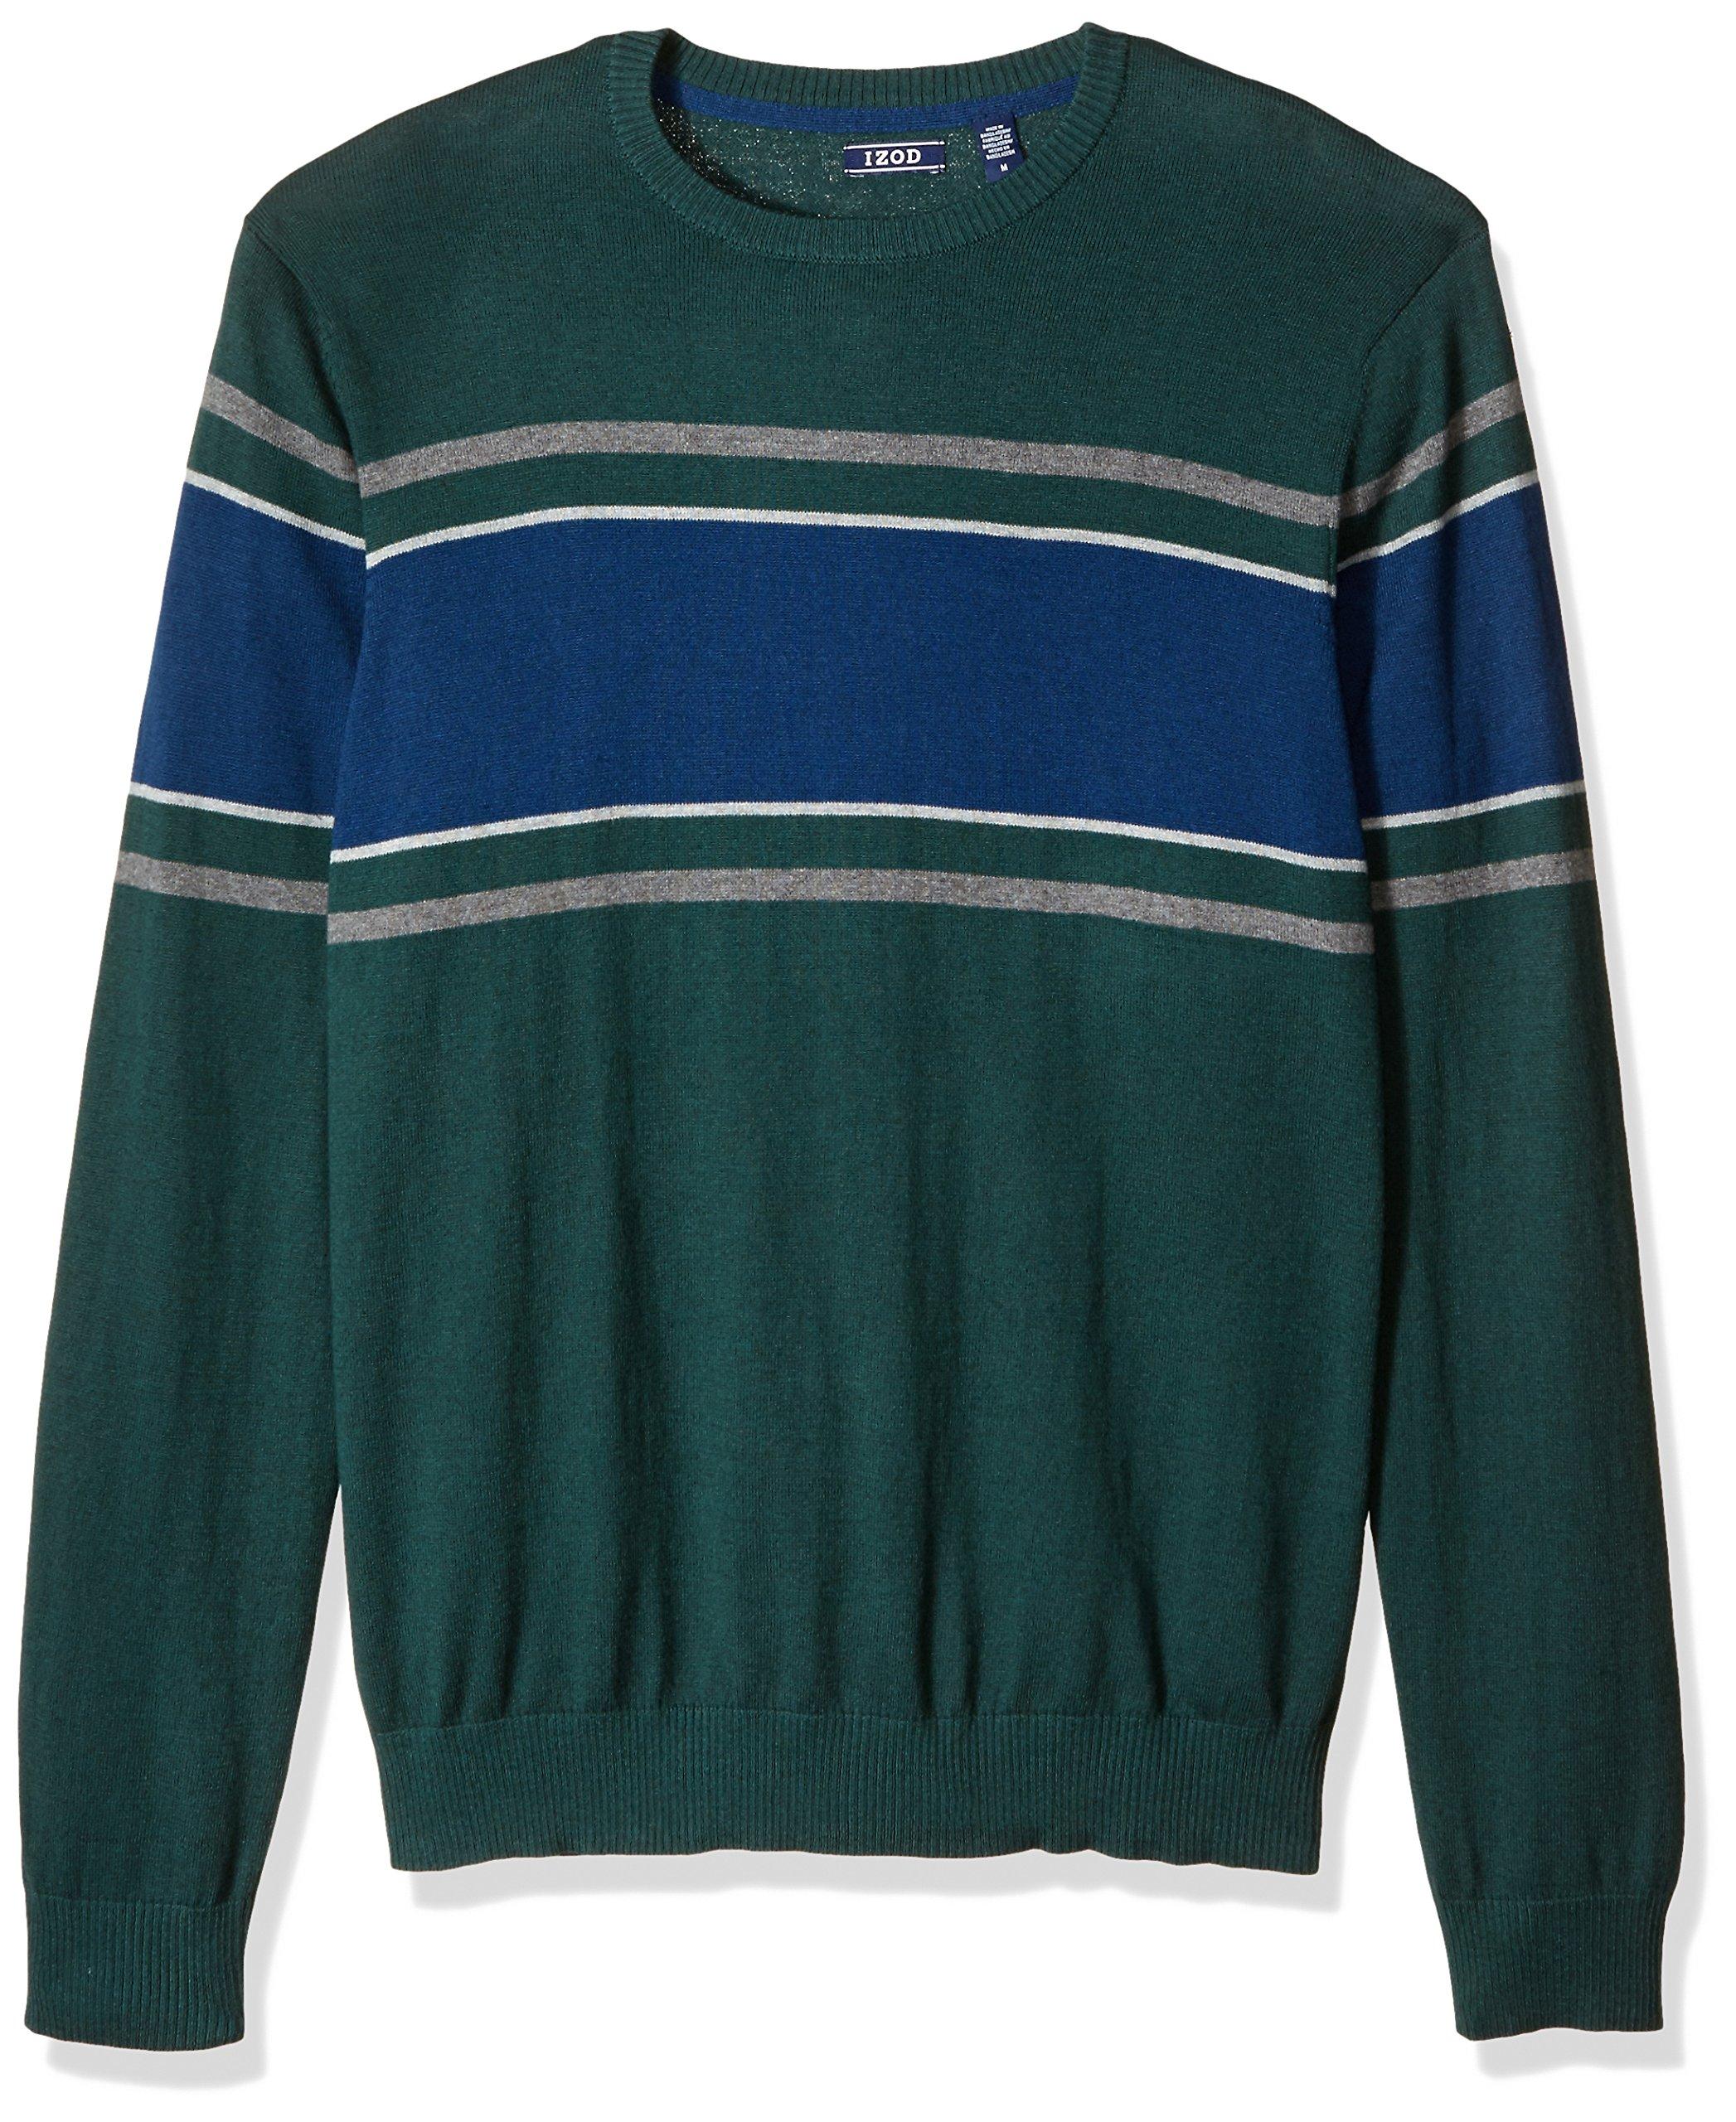 IZOD Men's Fine Gauge Crew Sweater, June Bug, X-Large